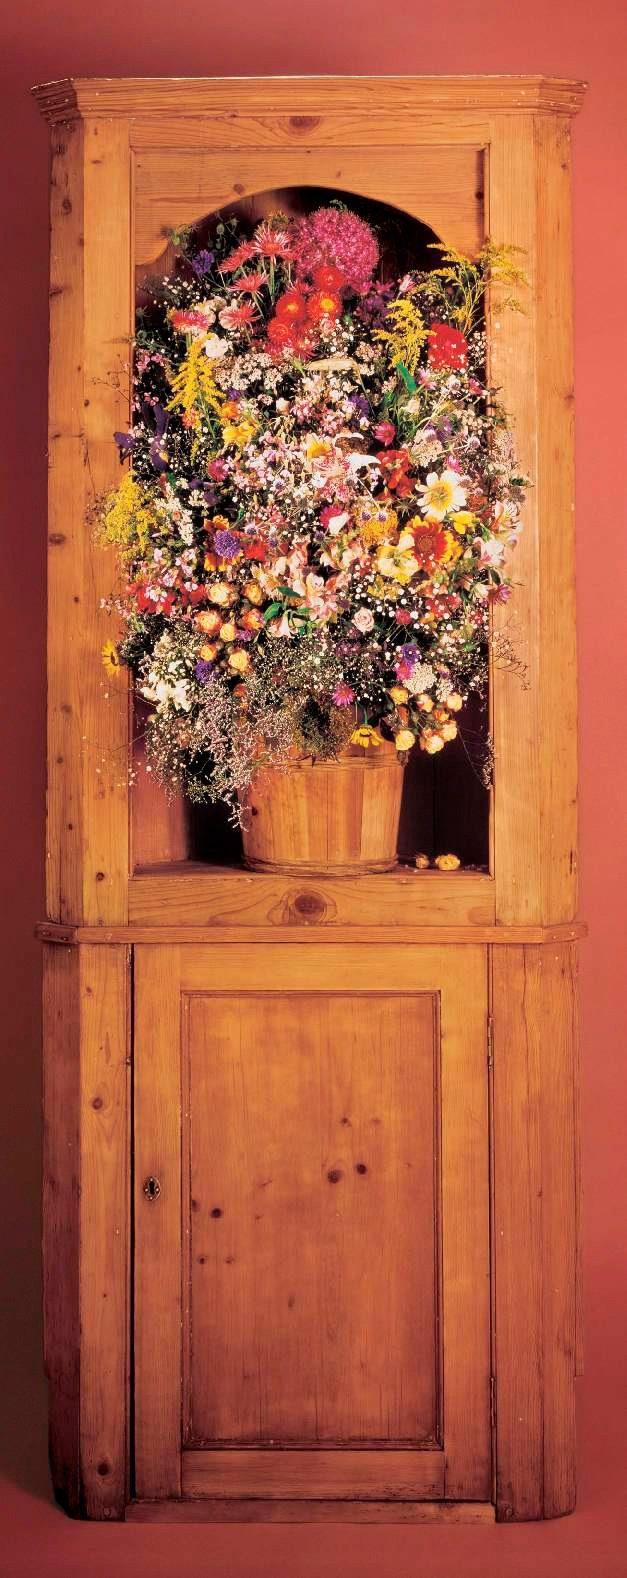 PAPERMOON Fototapete »Flower Ornament - Türtapete«, Vlies, 2 Bahnen, 90 x 200 cm